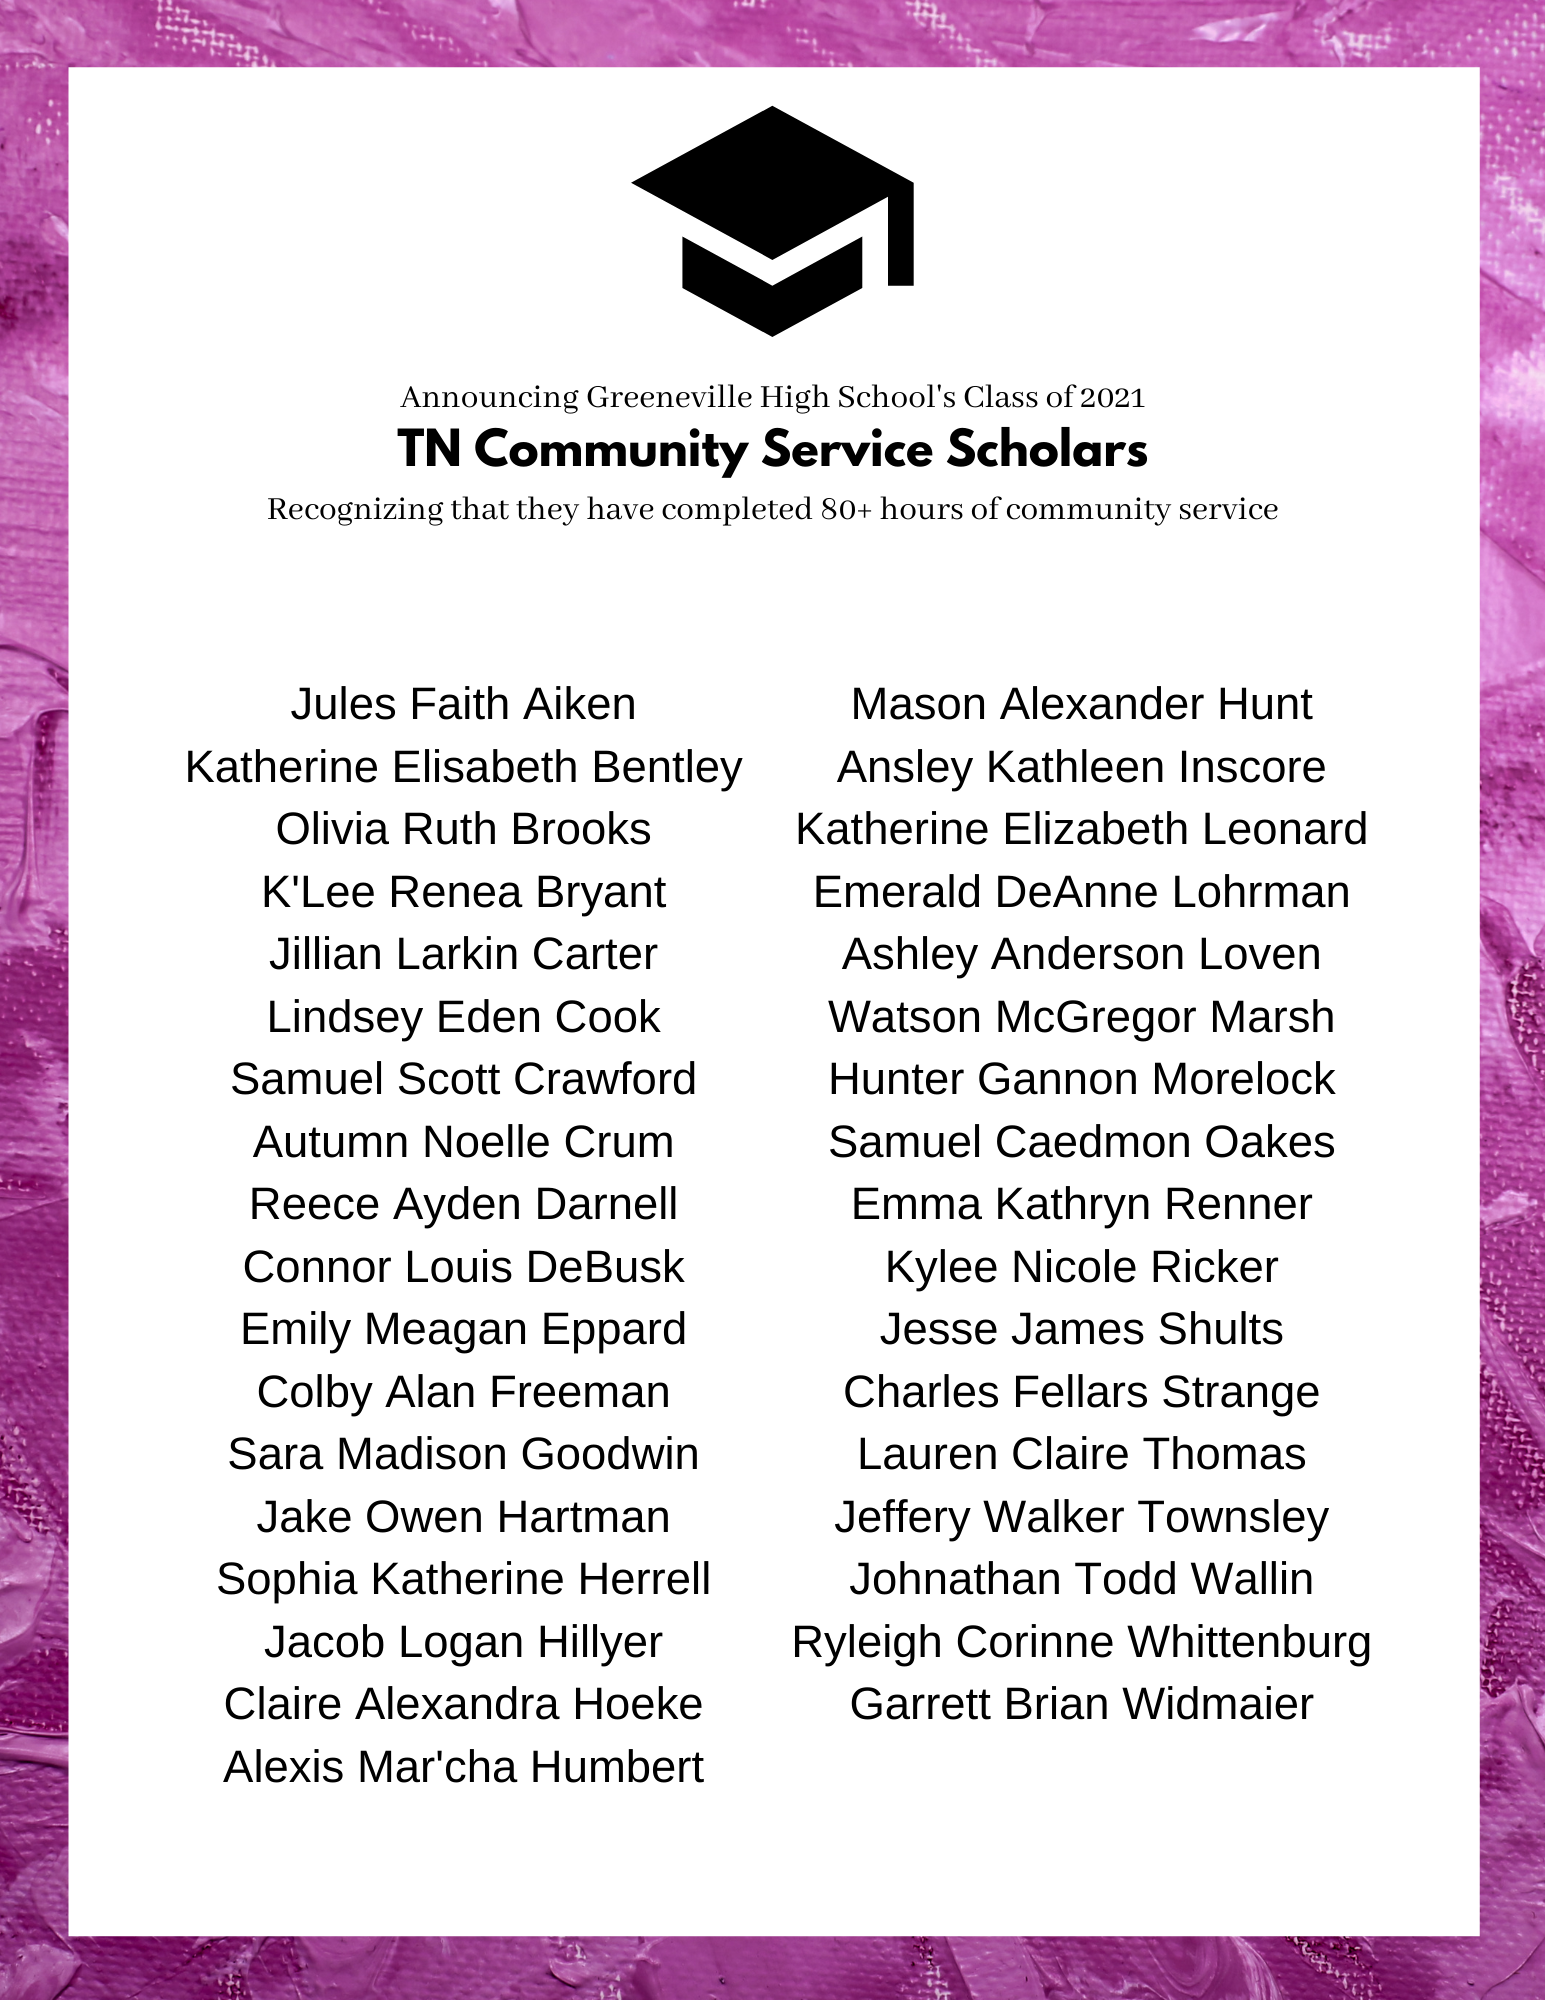 Class of 2021 TN Community Service Scholars